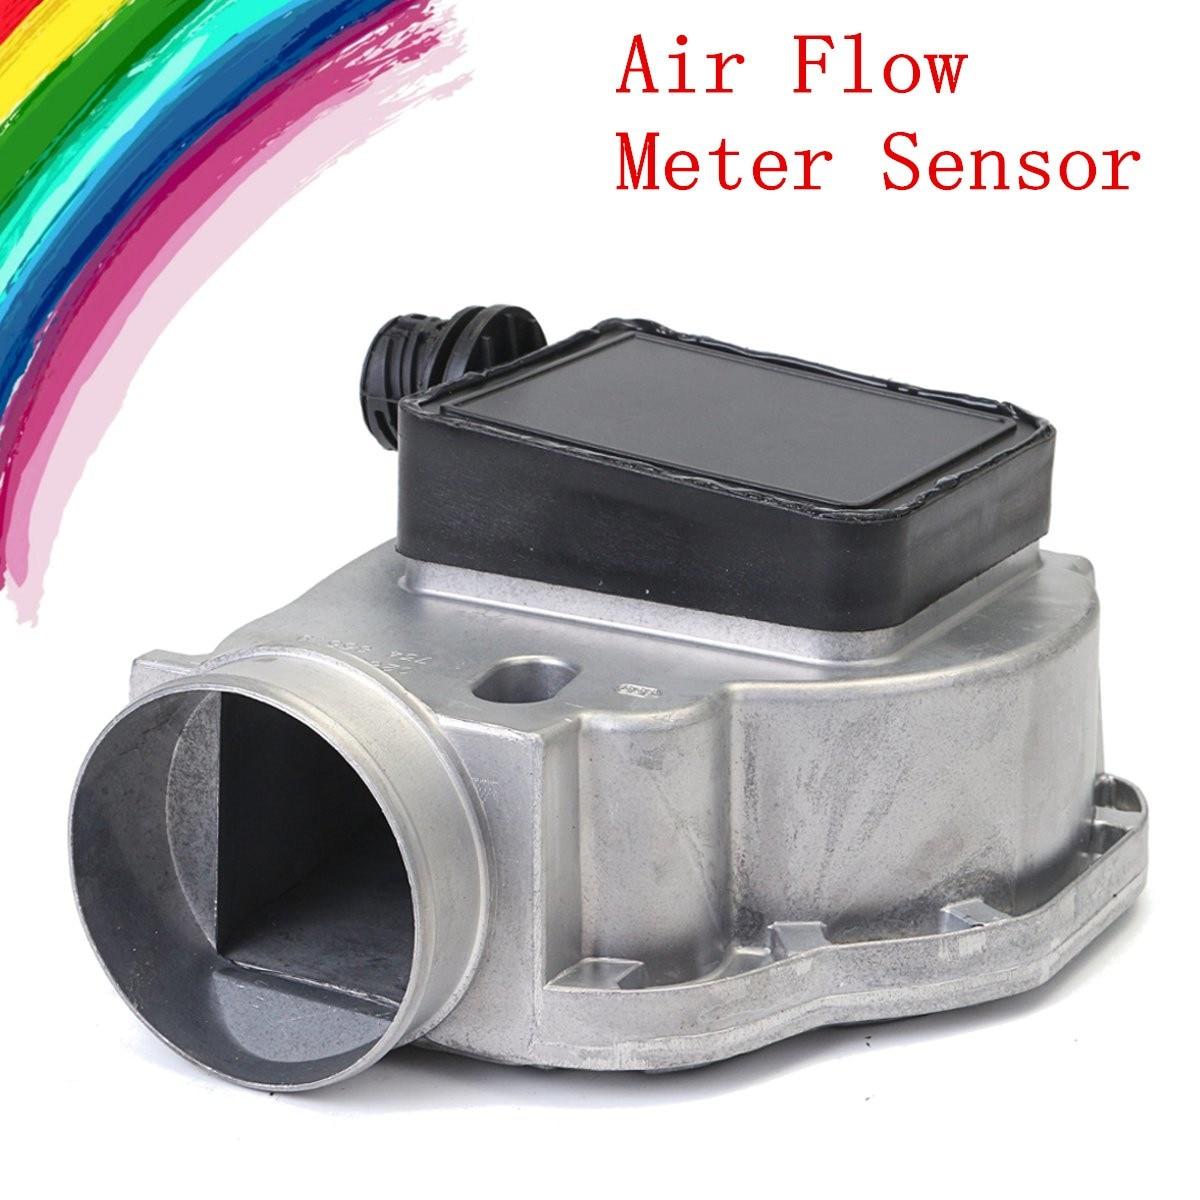 Air Flow Meter Sensor FOR BMW E30 E36 E34 Z3 318i 318ti 318is 1.8 518i цена